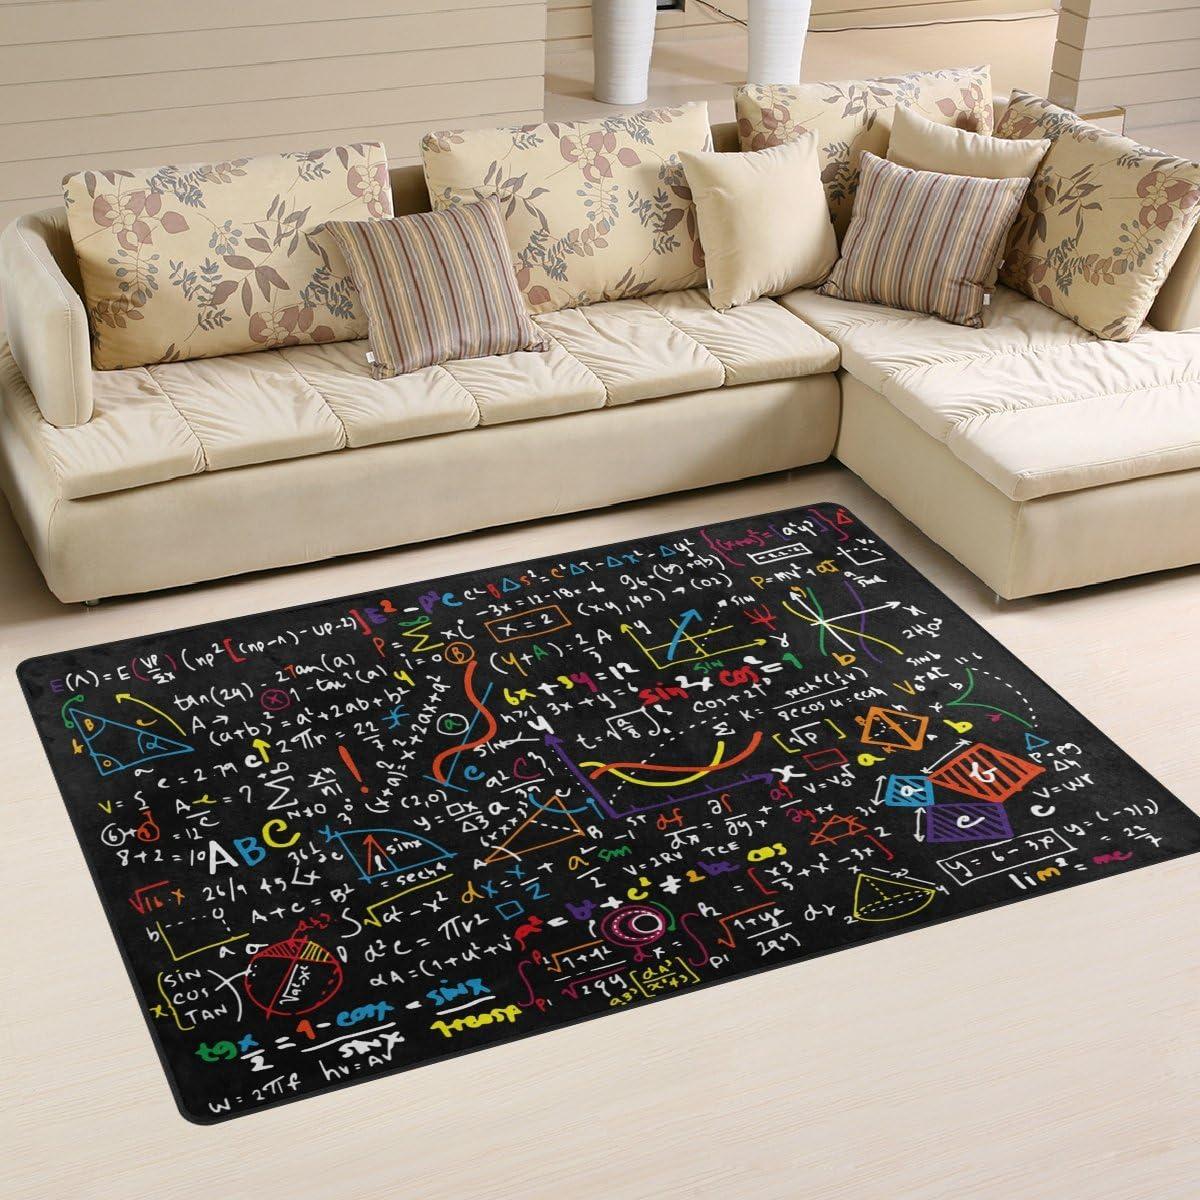 WOZO Black Math Linear Mathematics Education Area Rug Rugs Non-Slip Floor Mat Doormat